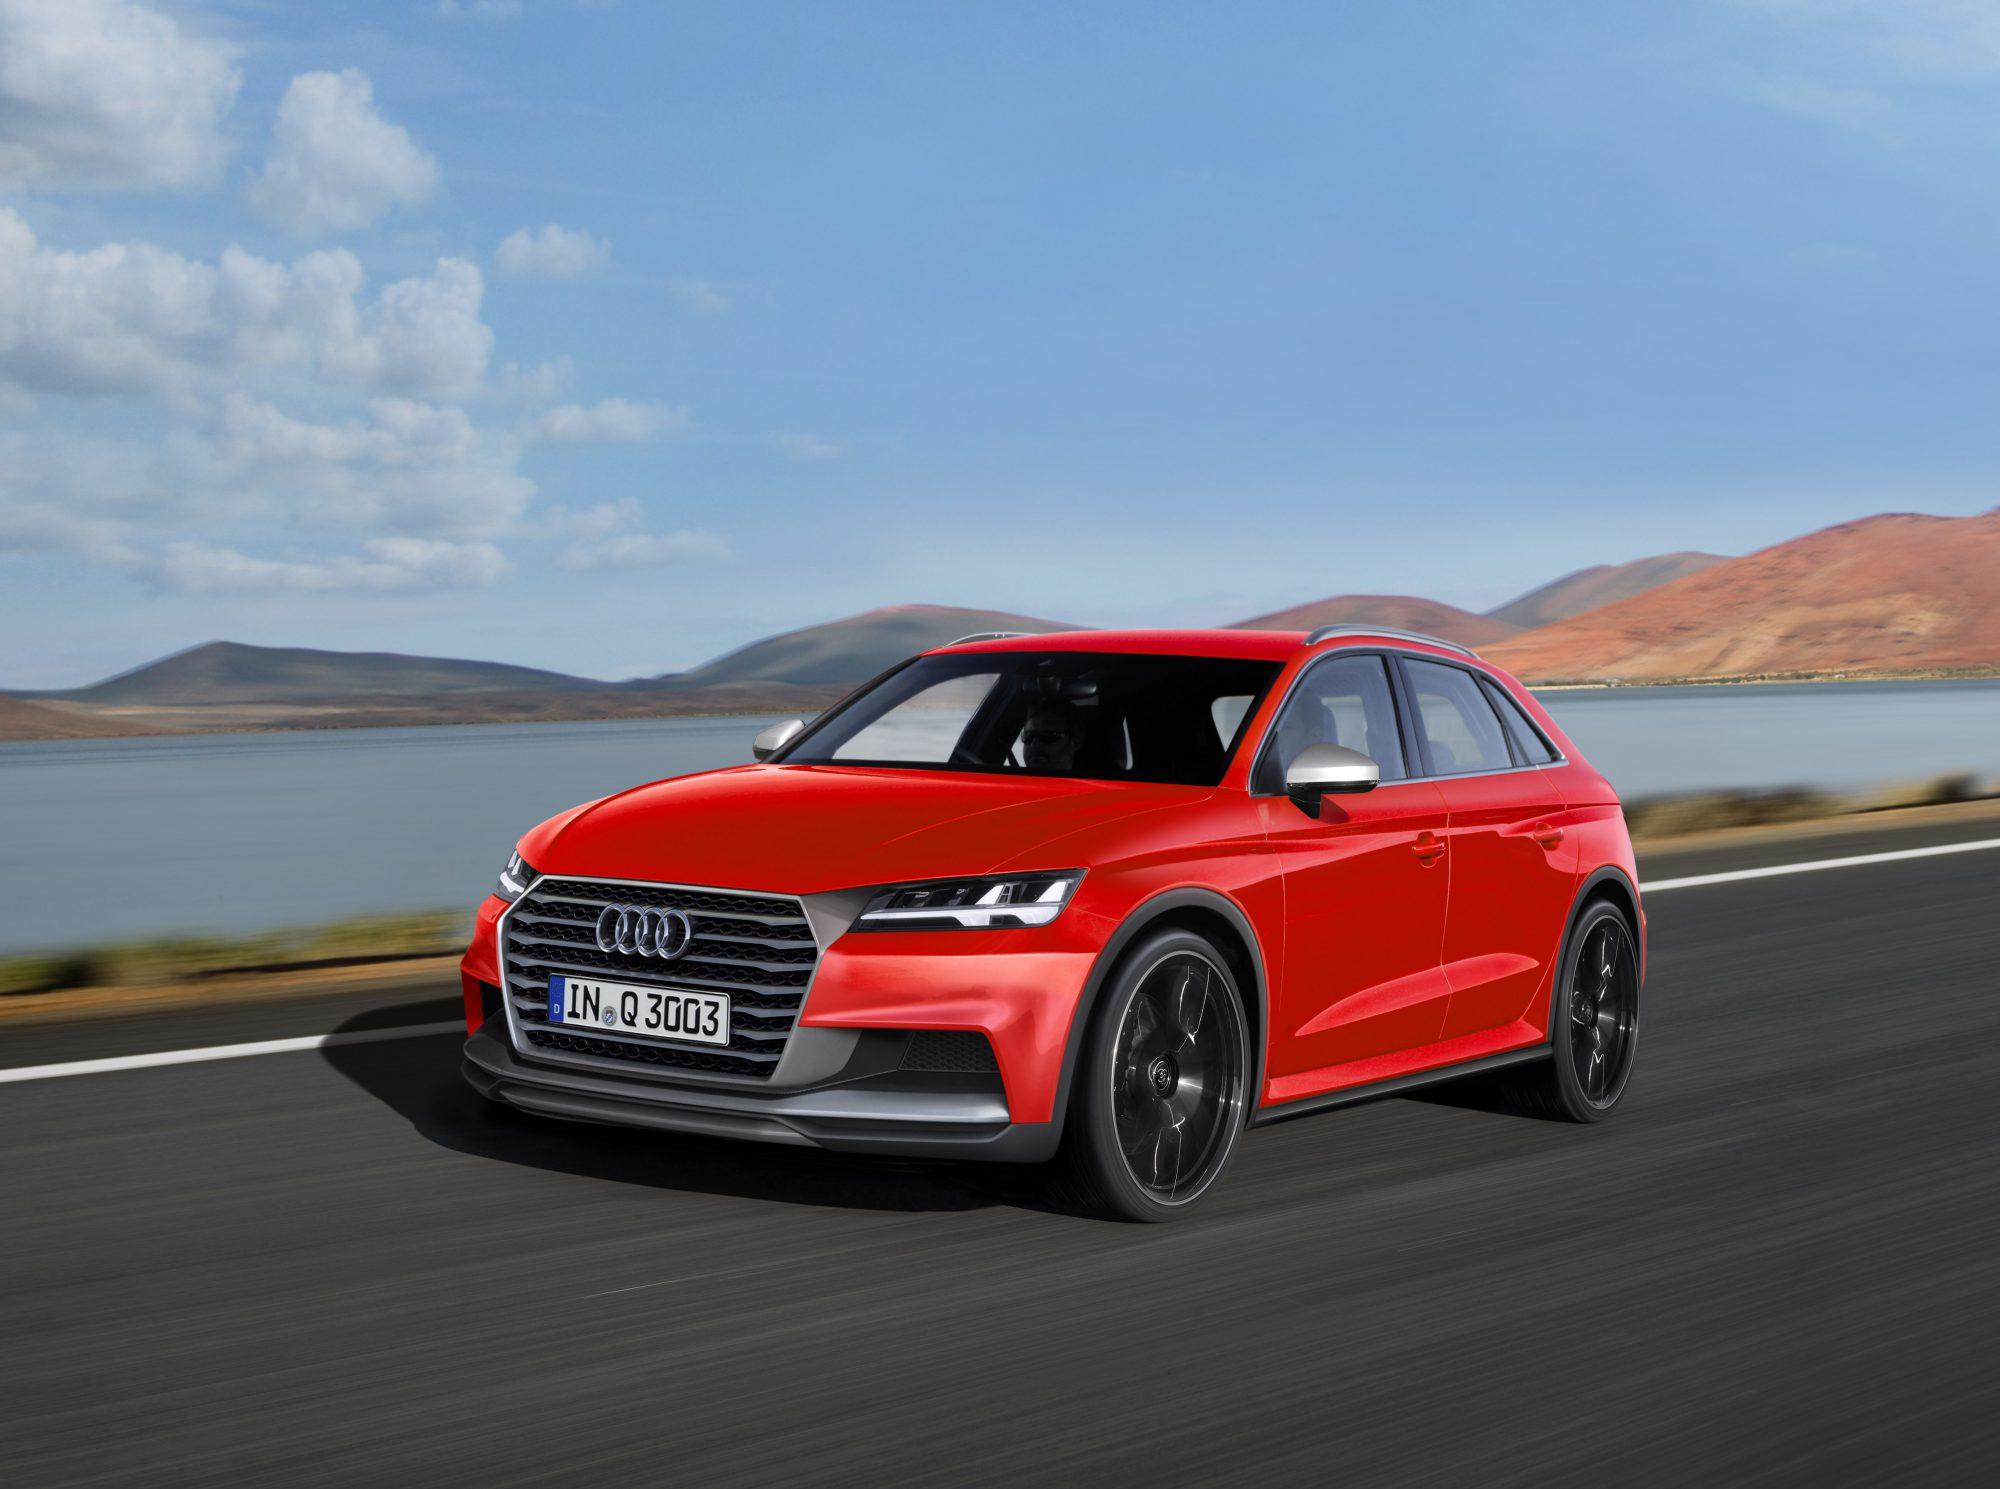 Audi SUV, computerillustratie Schulte Design